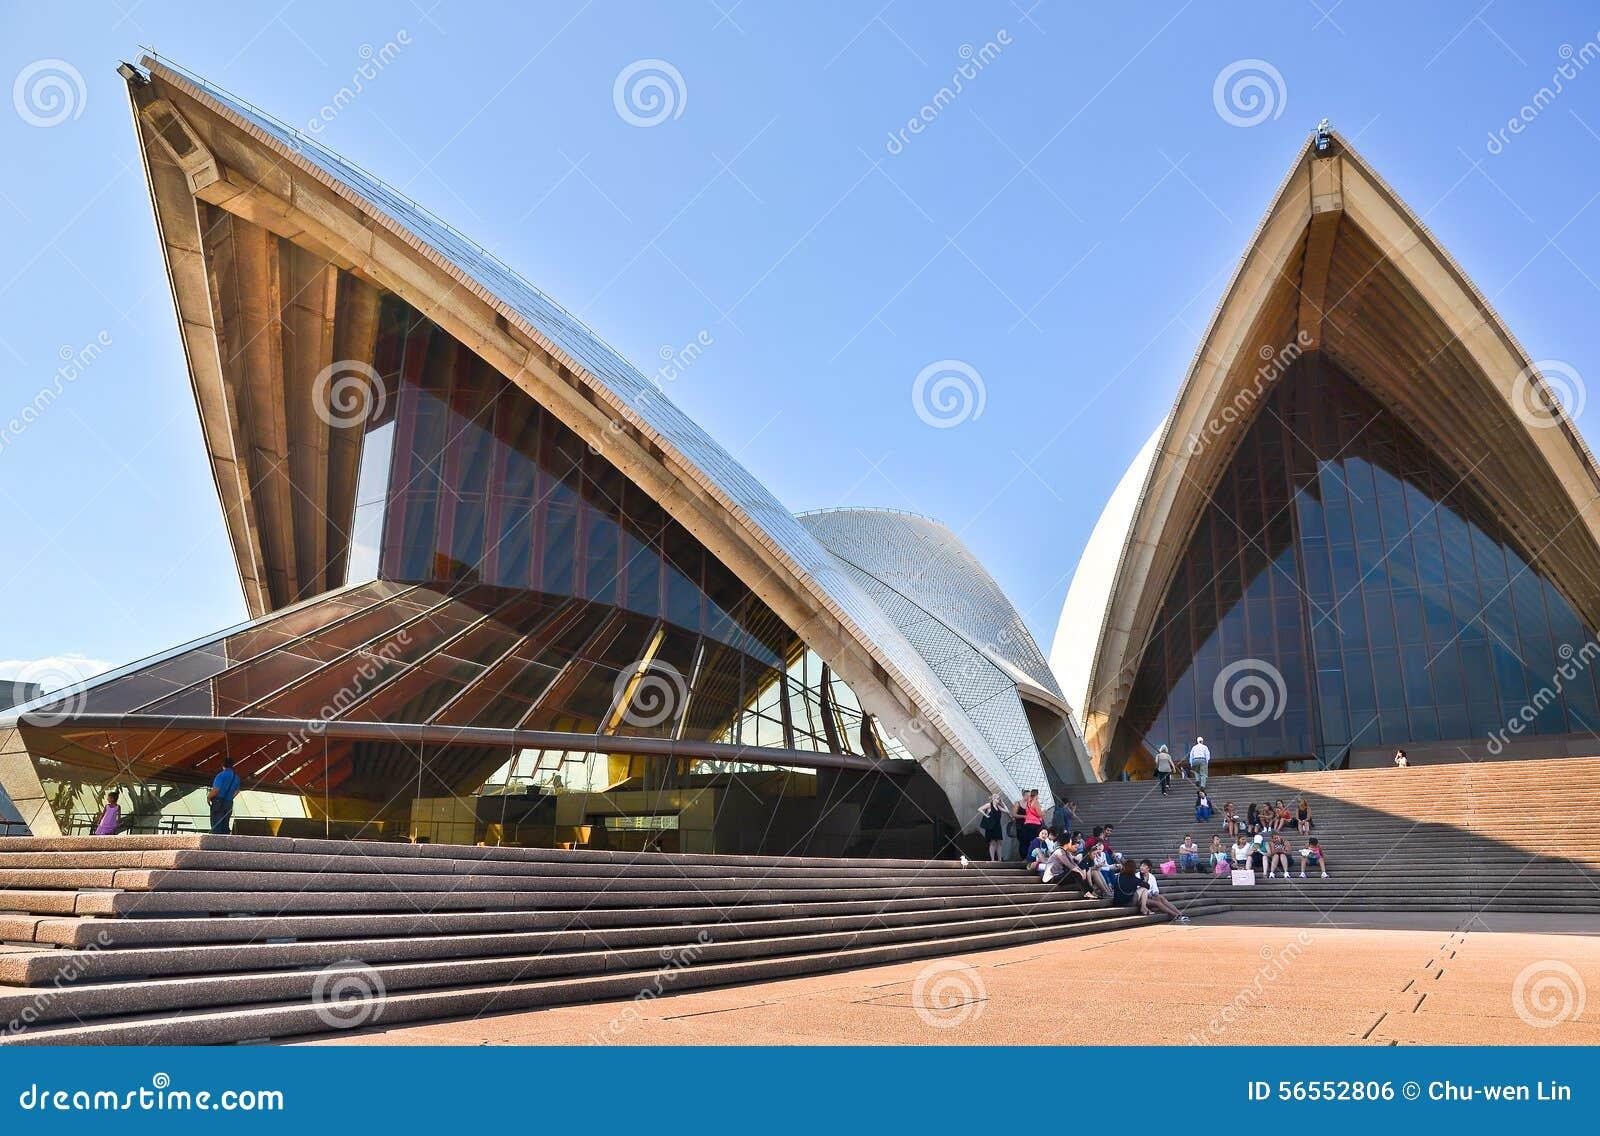 Download Άποψη της Όπερας του Σίδνεϊ Εκδοτική Εικόνες - εικόνα από αποβάθρα, εικονικός: 56552806